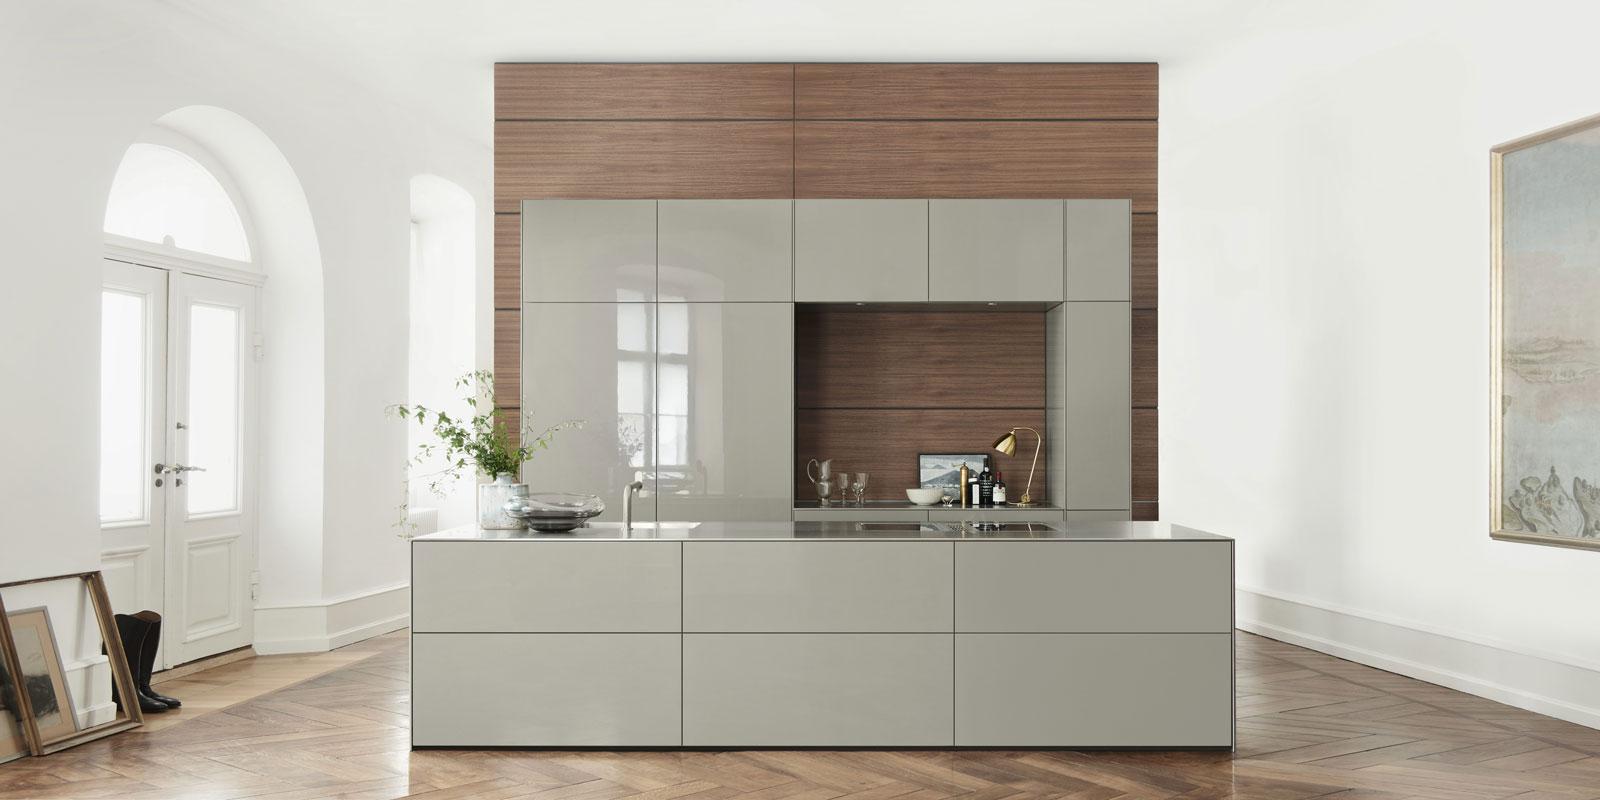 Keuken 10000 euro keuken 3 meter lang keuken 5 meter lang keuken afmetingen keuken antraciet - Keuken bulthaup catalogus ...